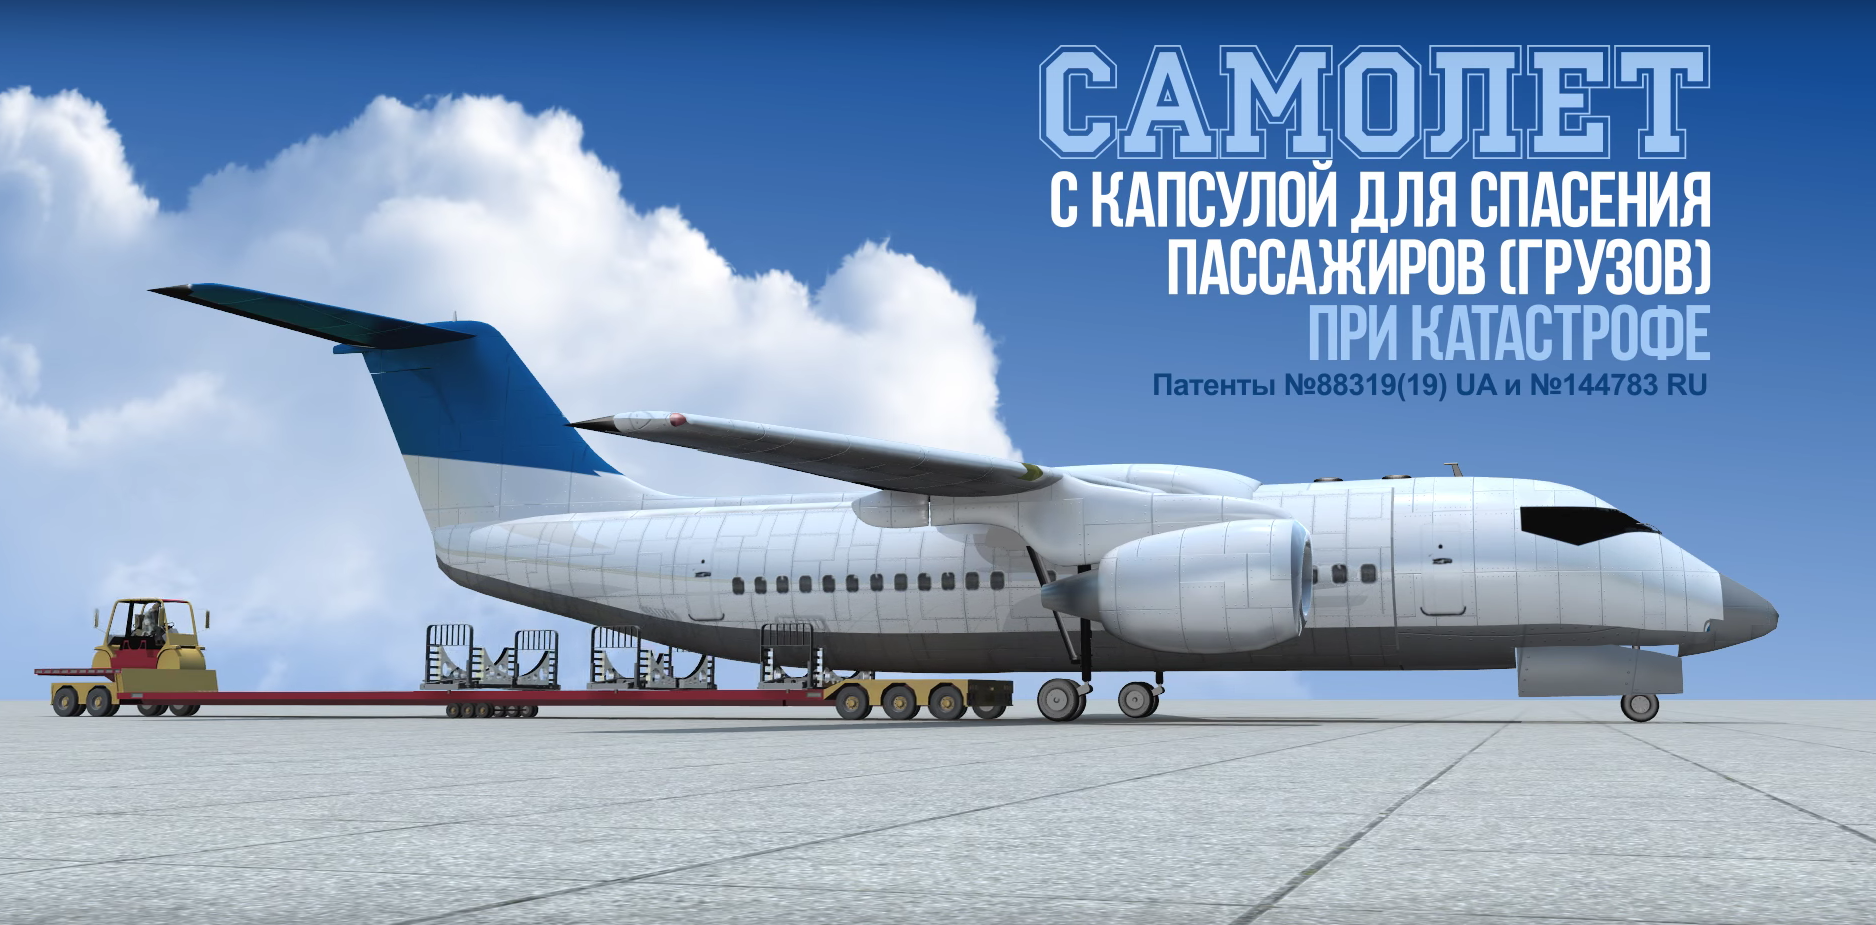 cabina avion desmontable segura 3